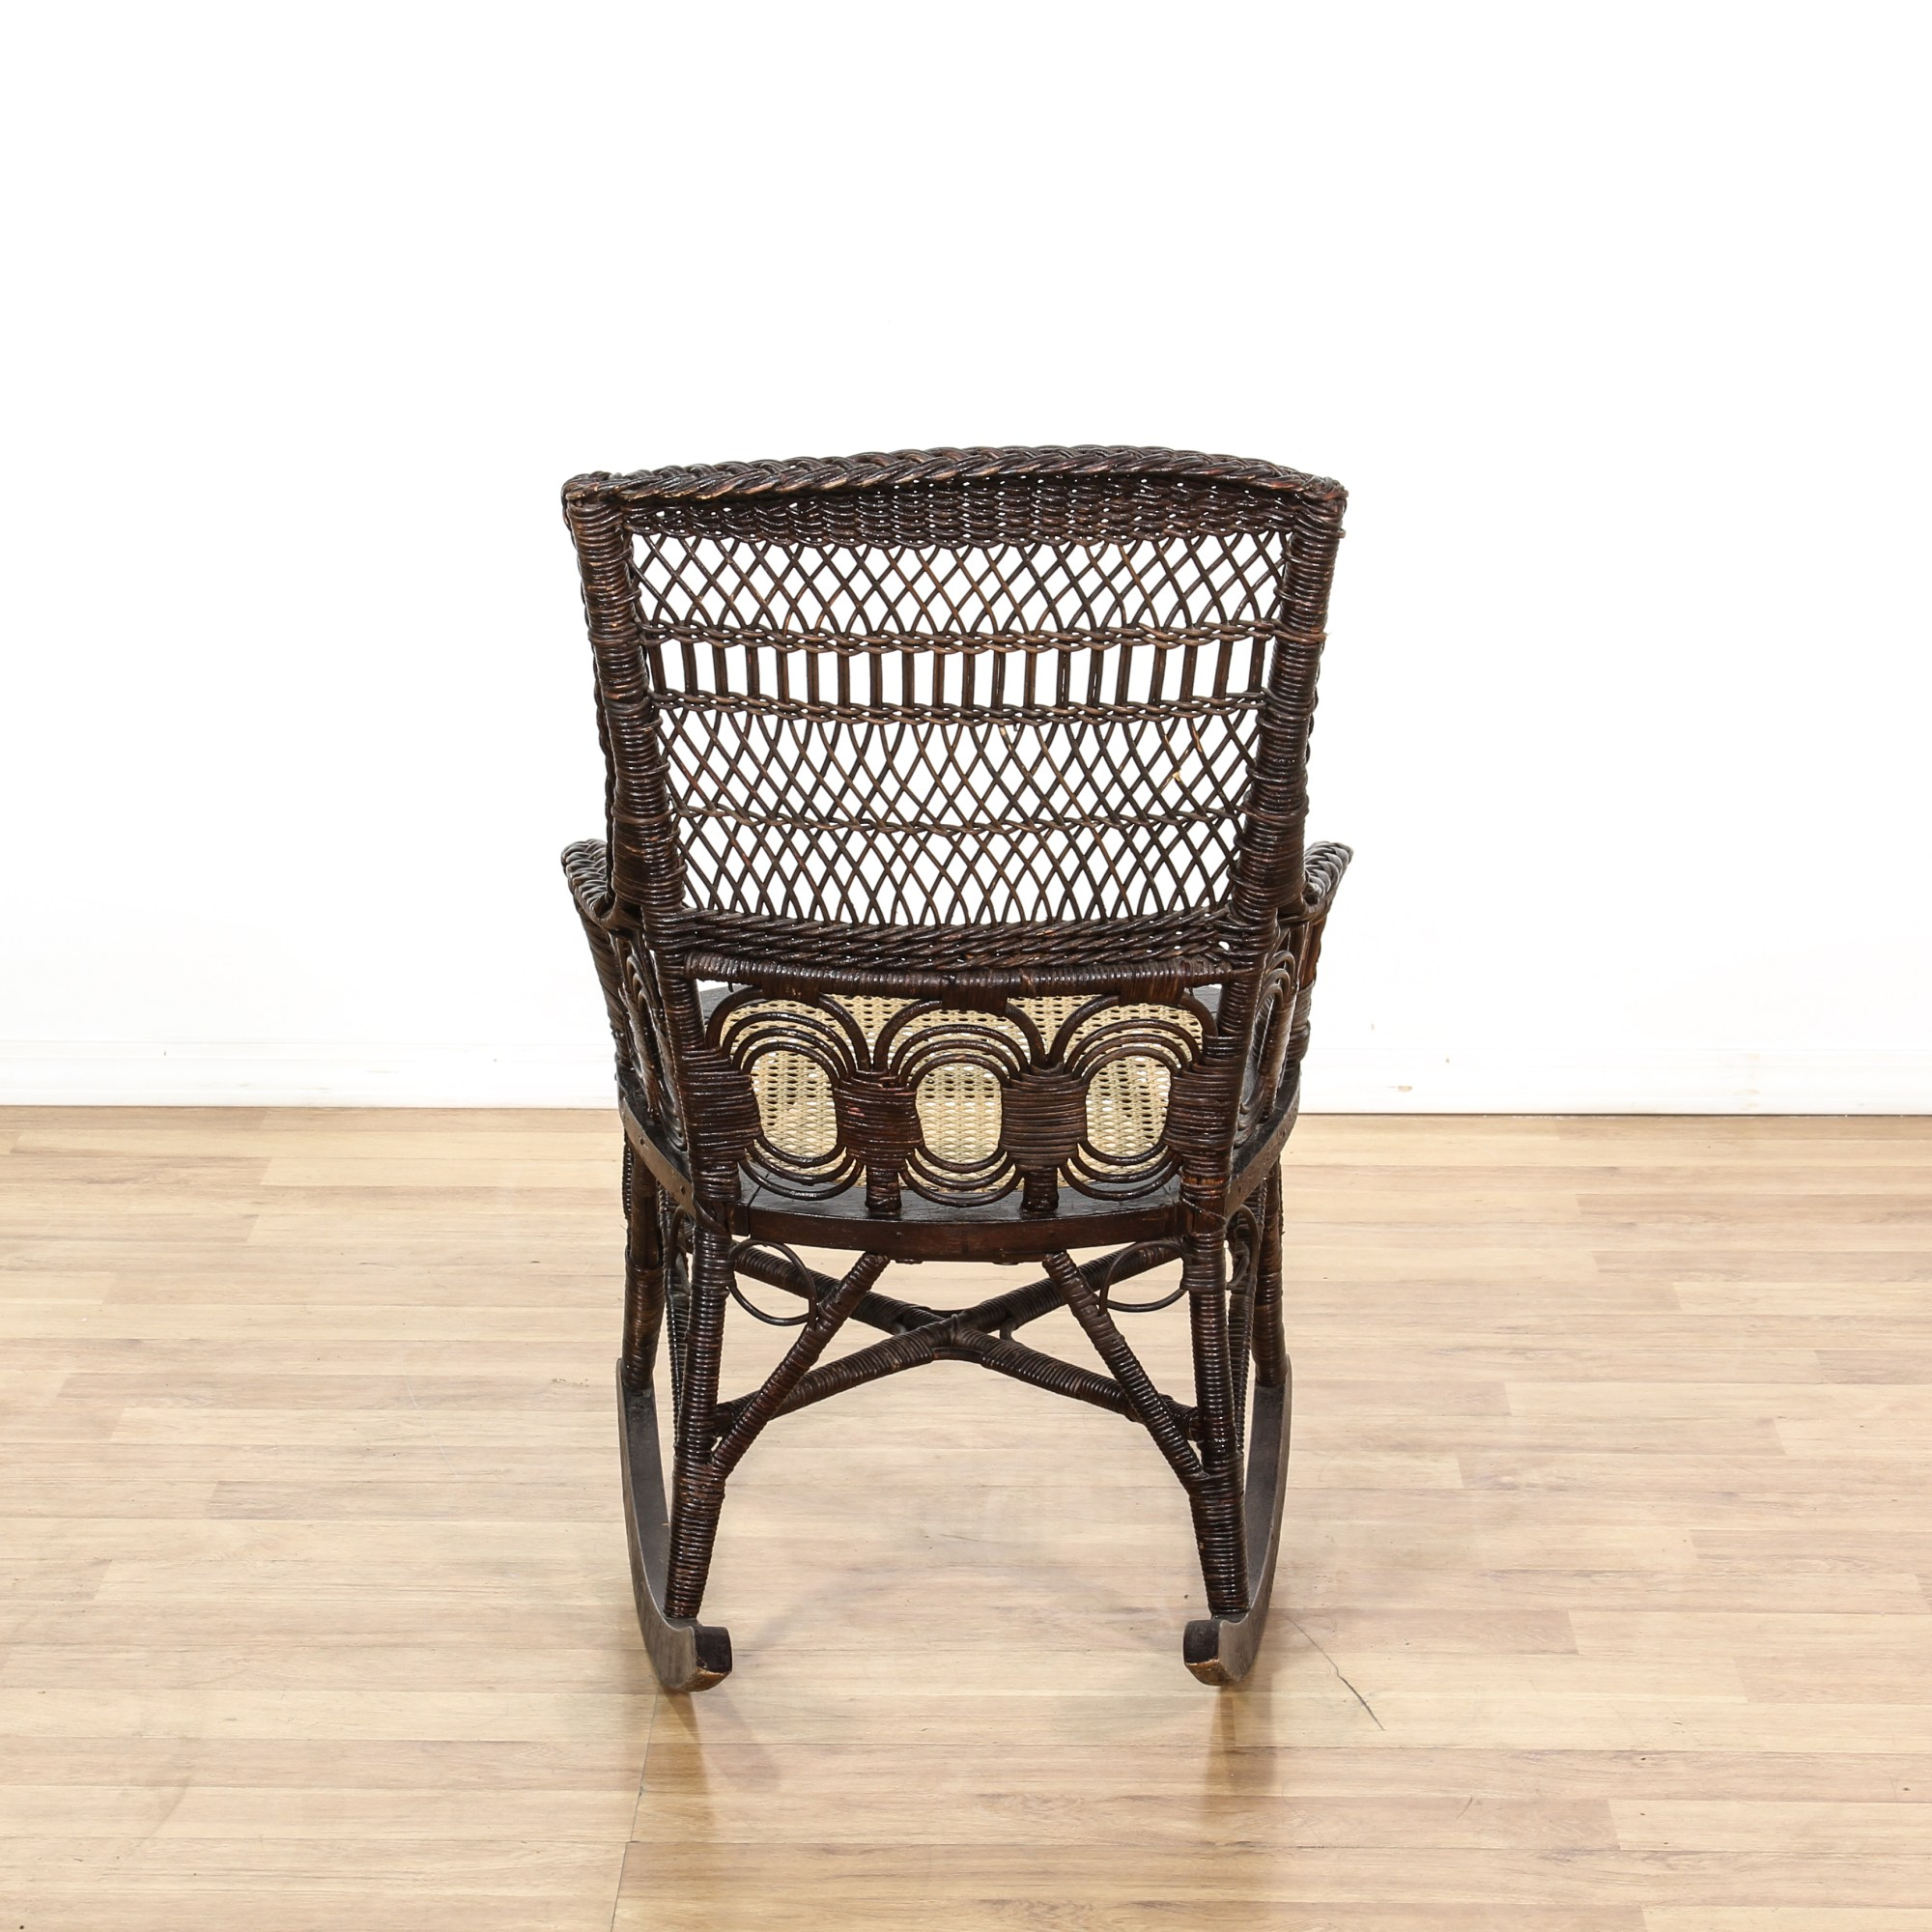 Black Wicker Rocking Chairs